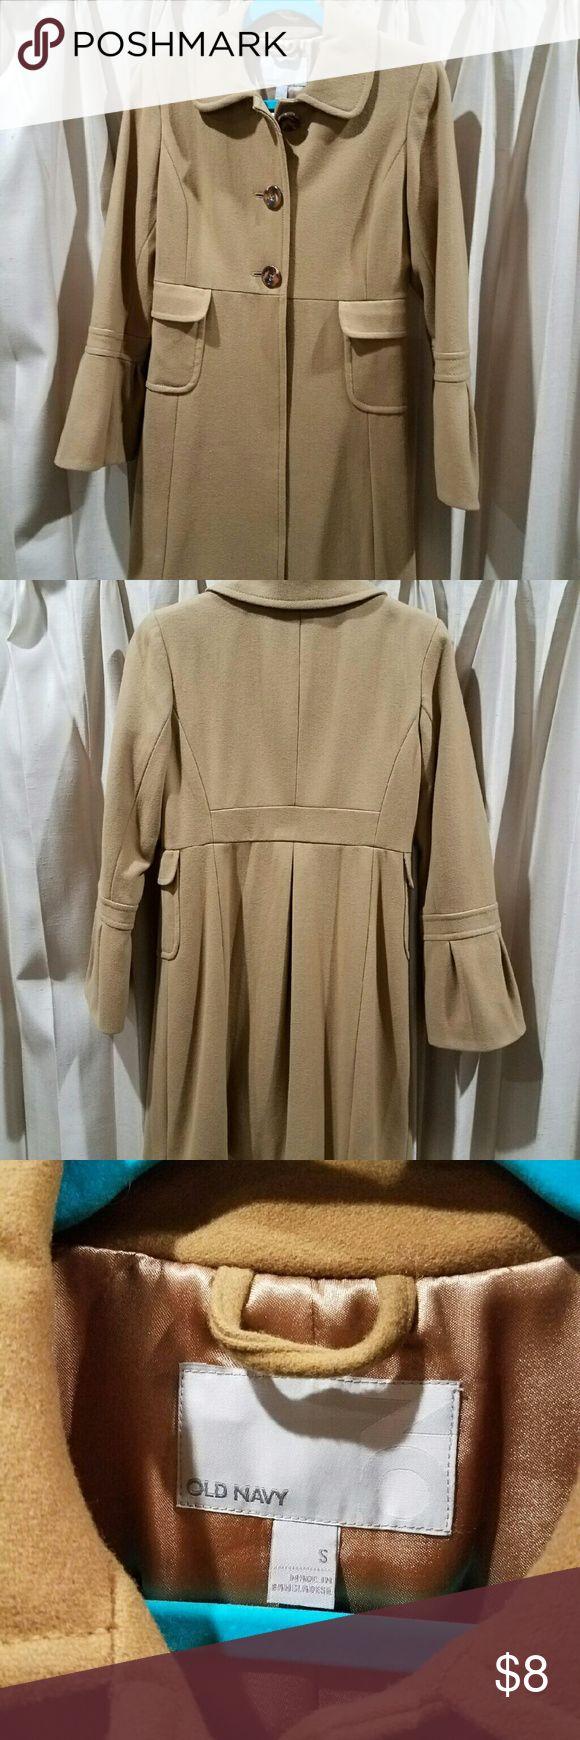 Old Navy Pea Coat Like new, camel color, lined. Old Navy Jackets & Coats Pea Coats